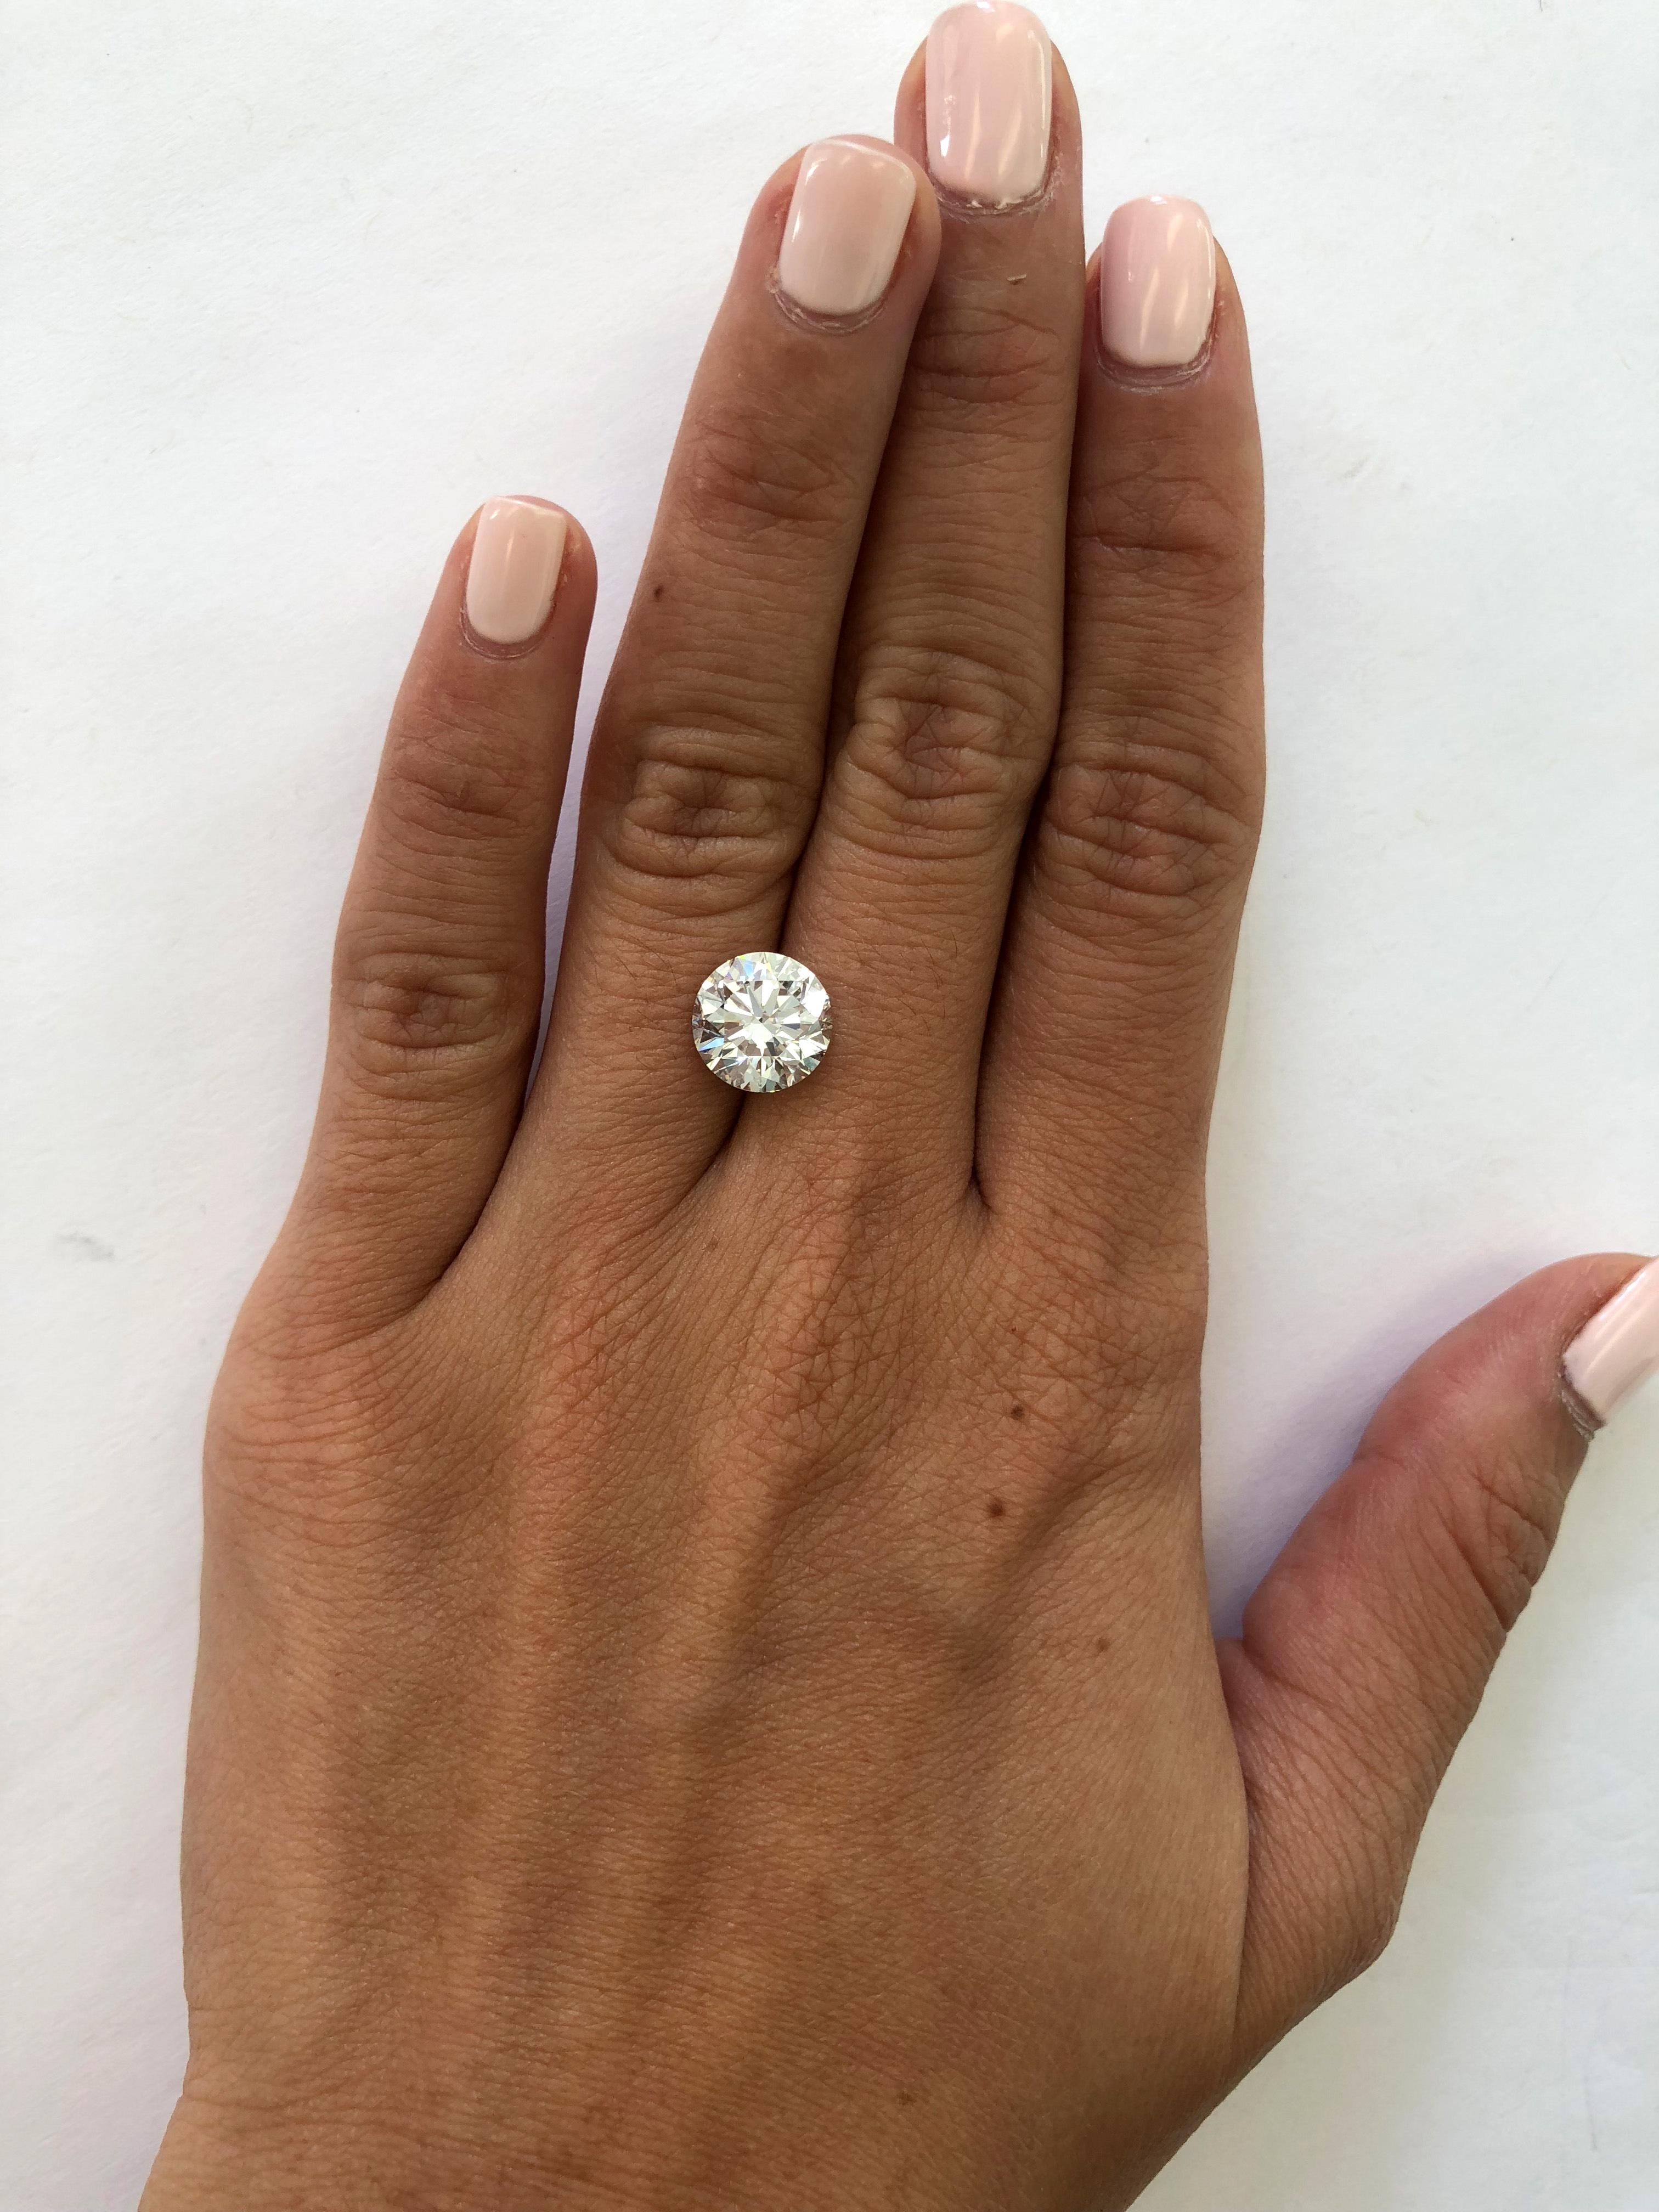 hand with 3 carat diamond